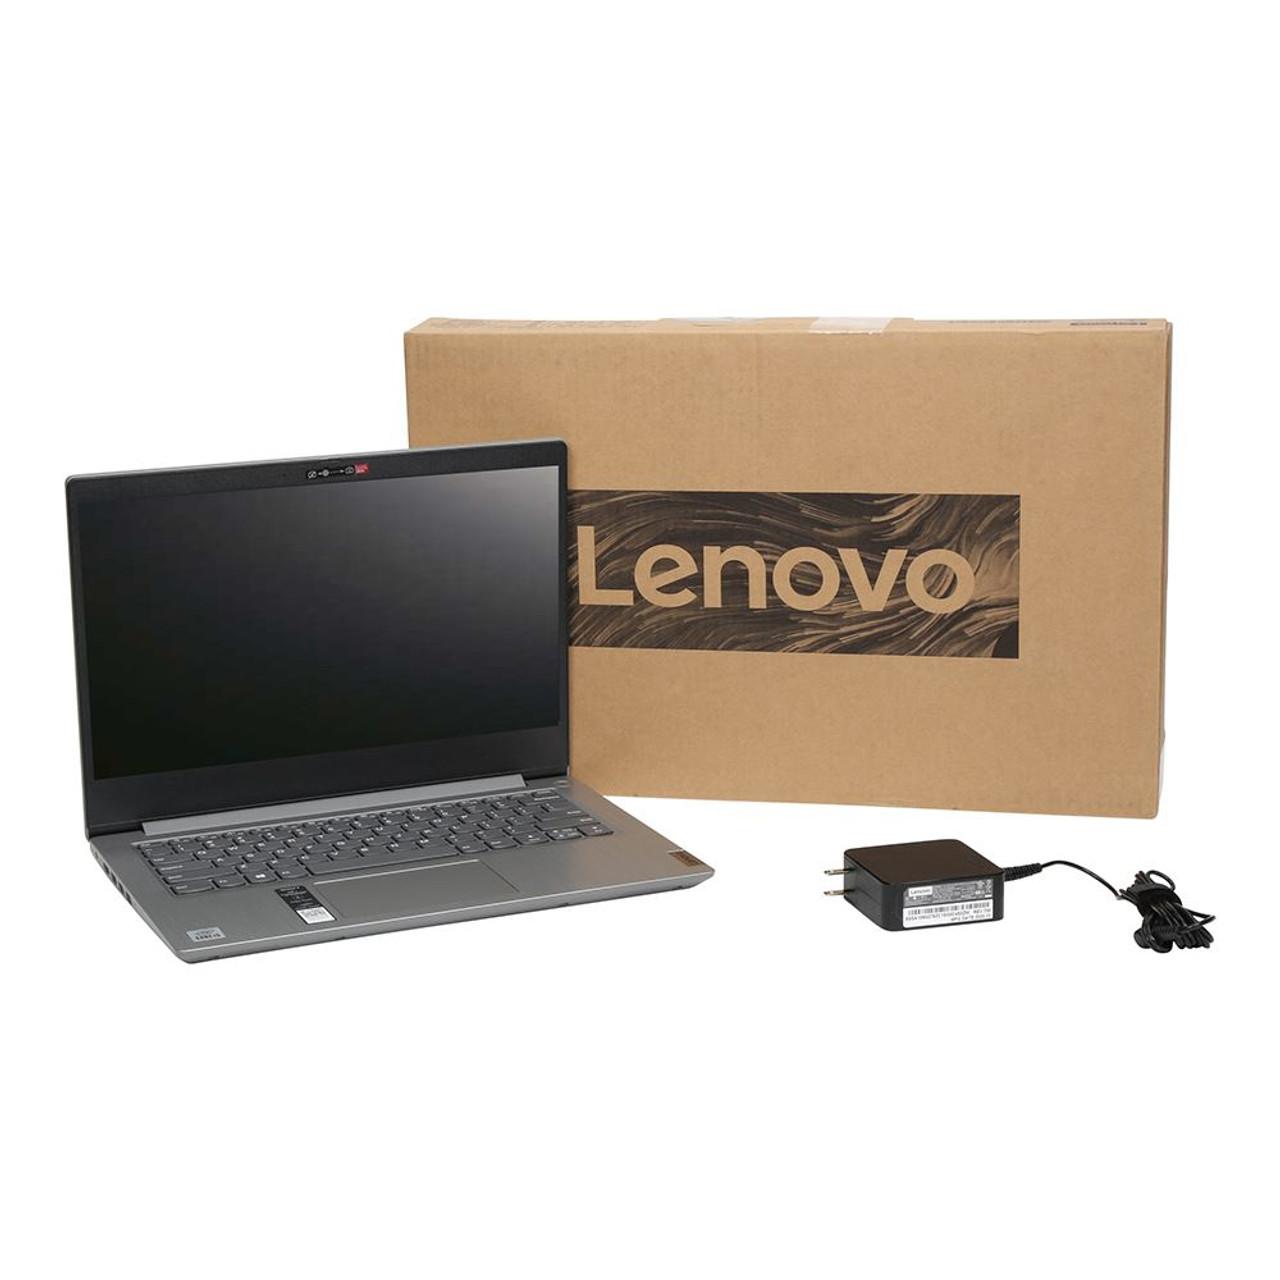 "Lenovo 14""  IdeaPad 3 Laptop Intel Core i5 10th Gen 1035G1 1.0GHz Processor; 8GB RAM; 512GB Solid State Drive"